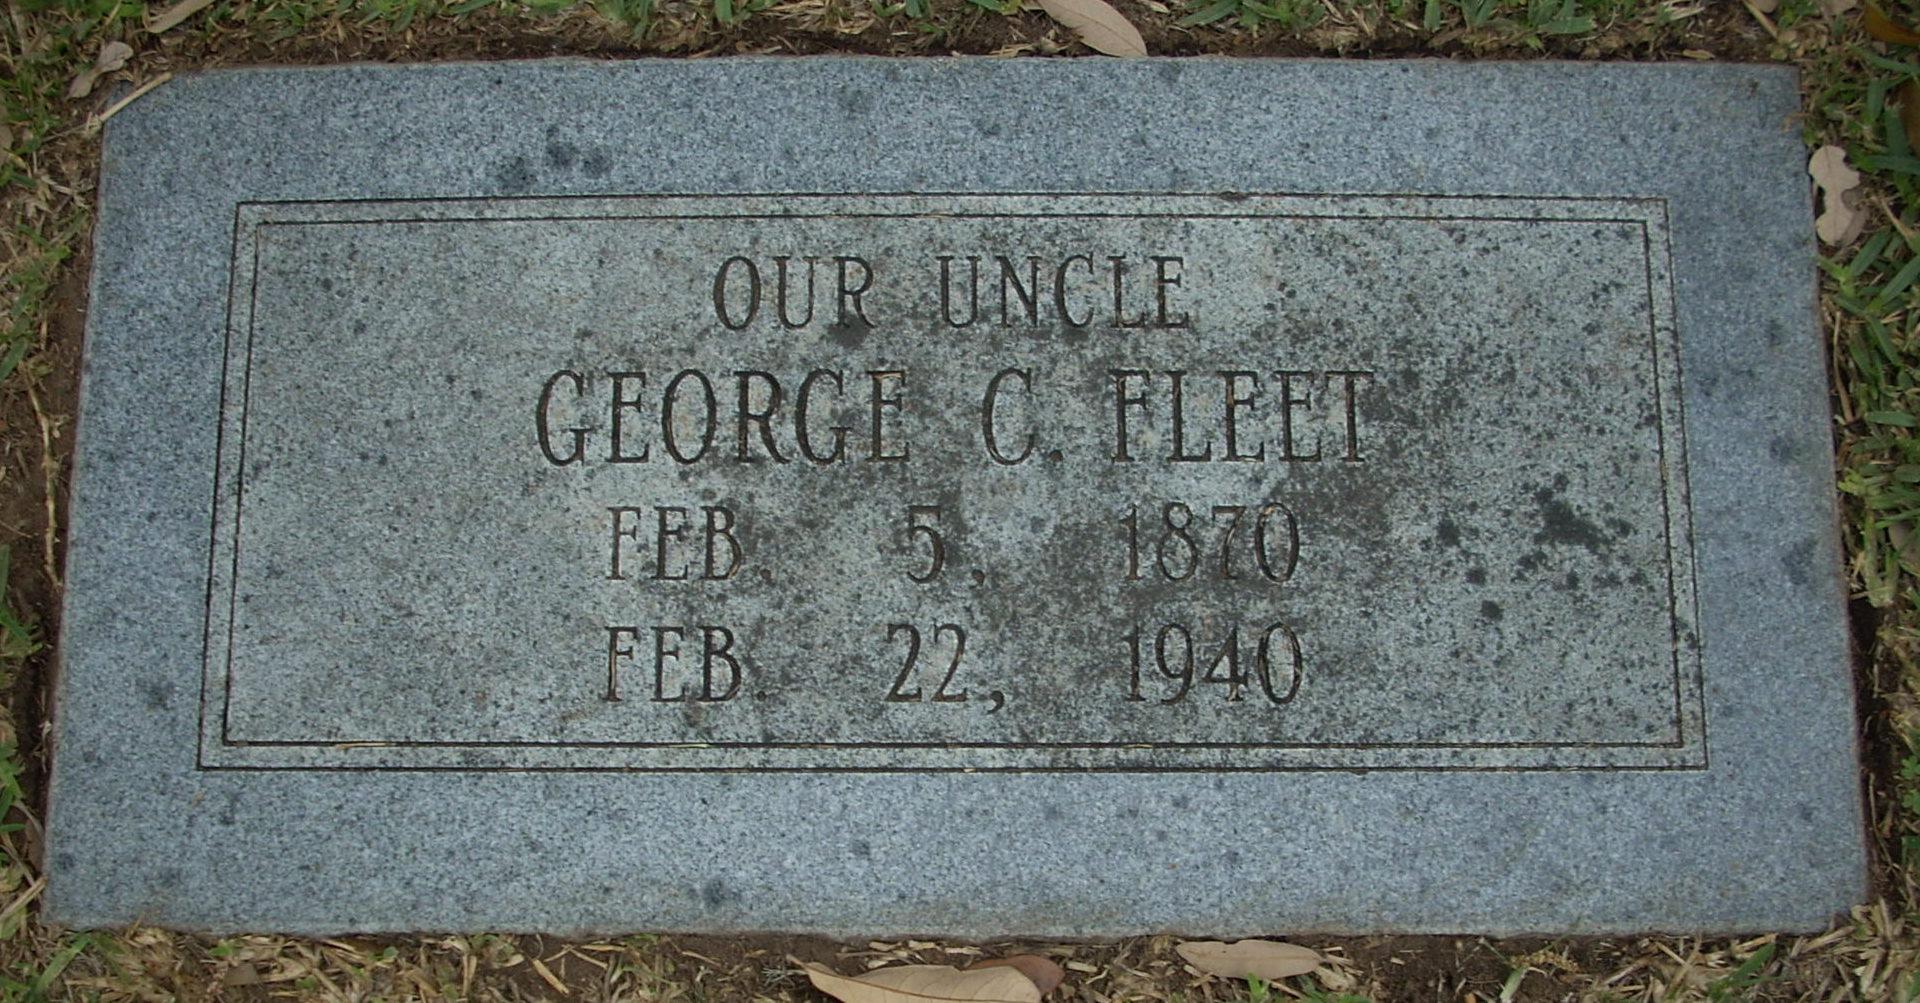 George Clark Fleet